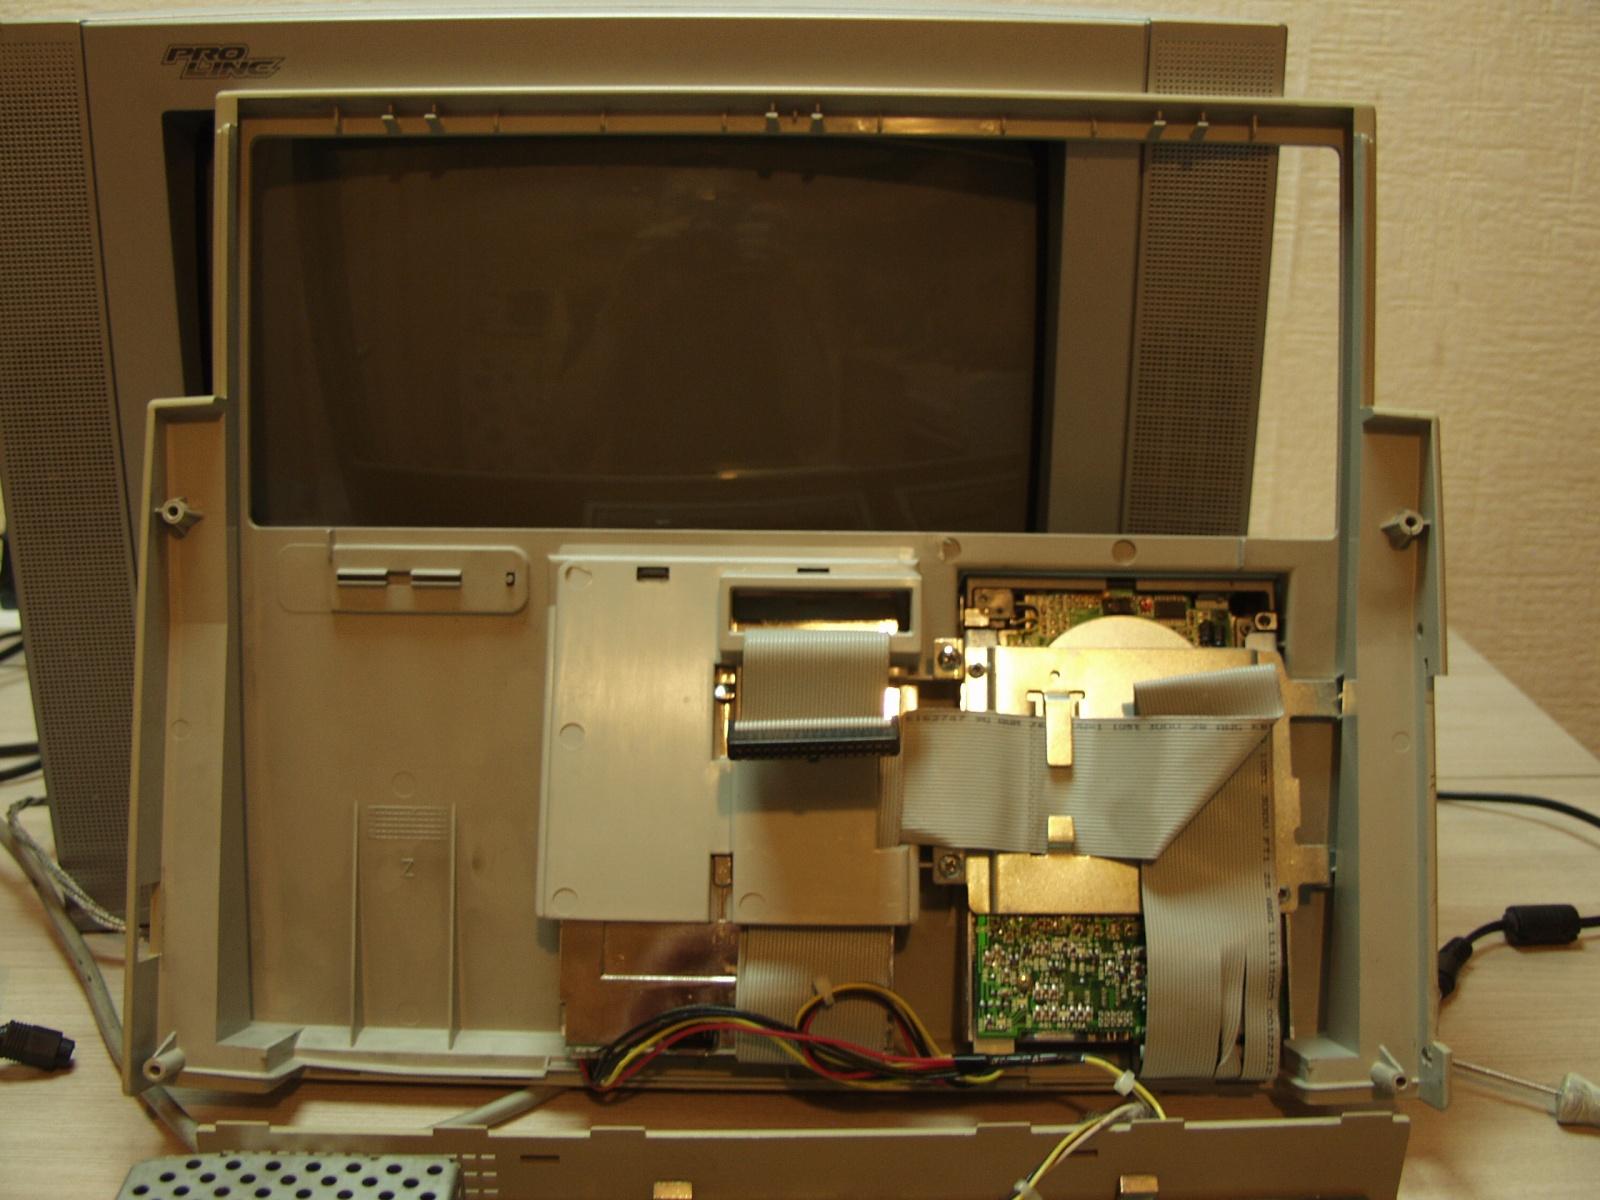 Итальянская IBM-PC Olivetti Prodest PC1 HD - 10